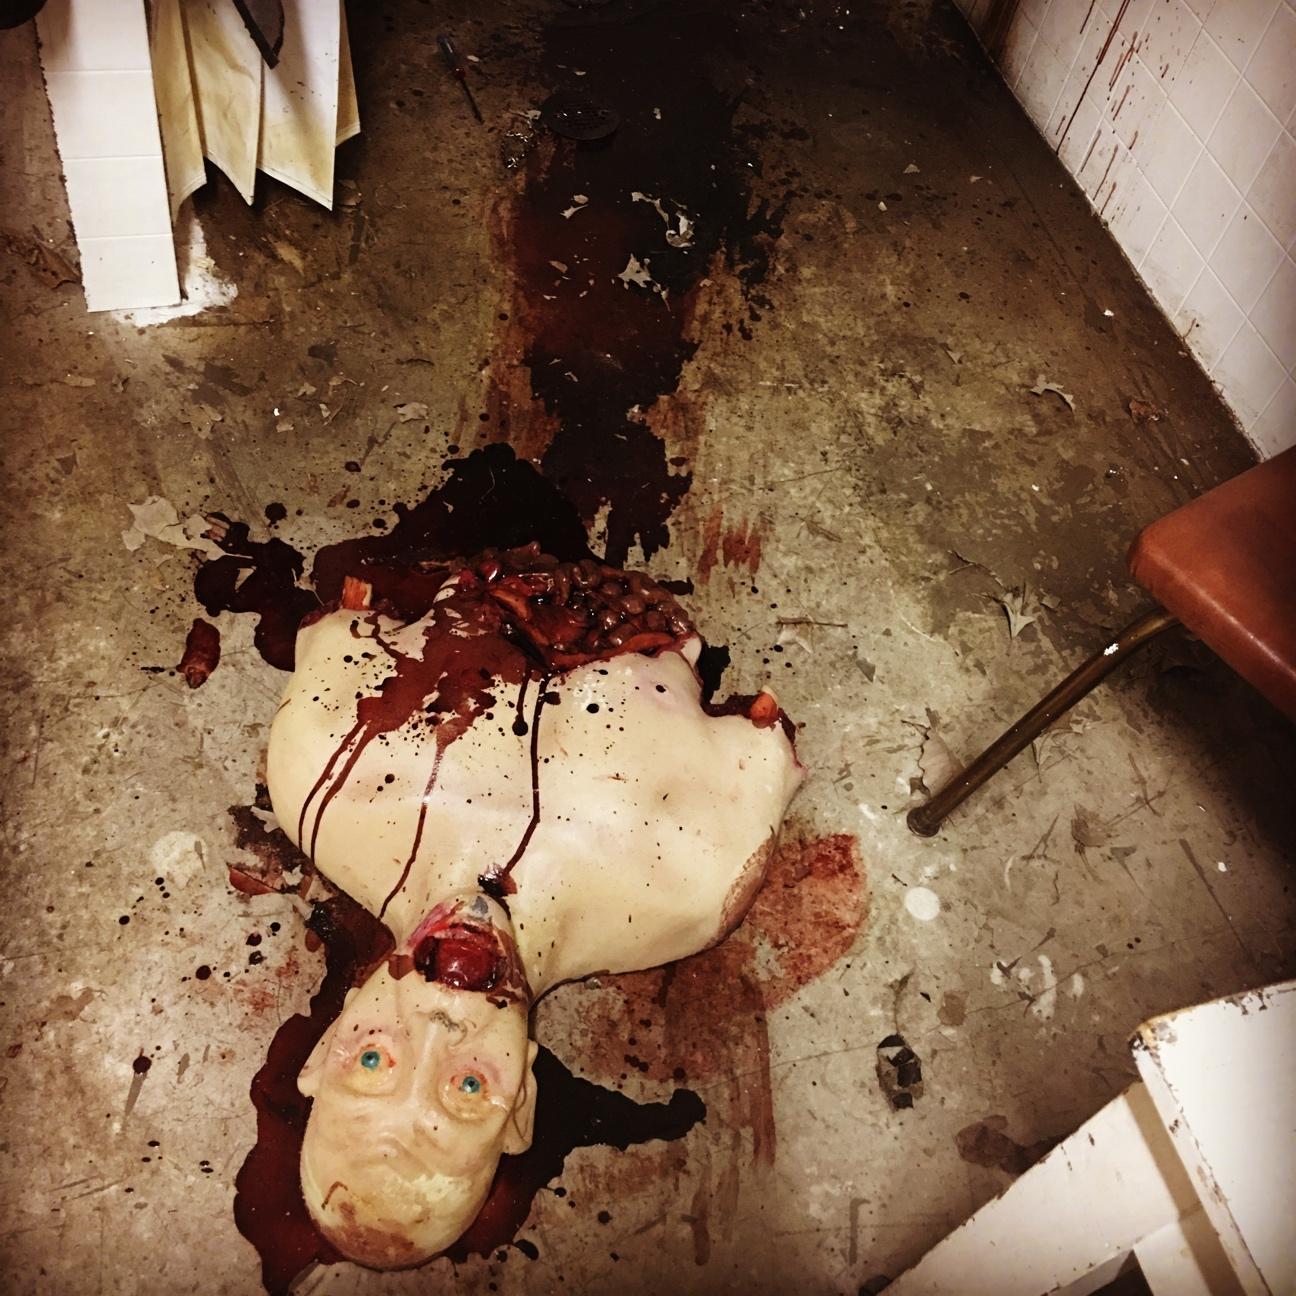 eat-corpse.jpg